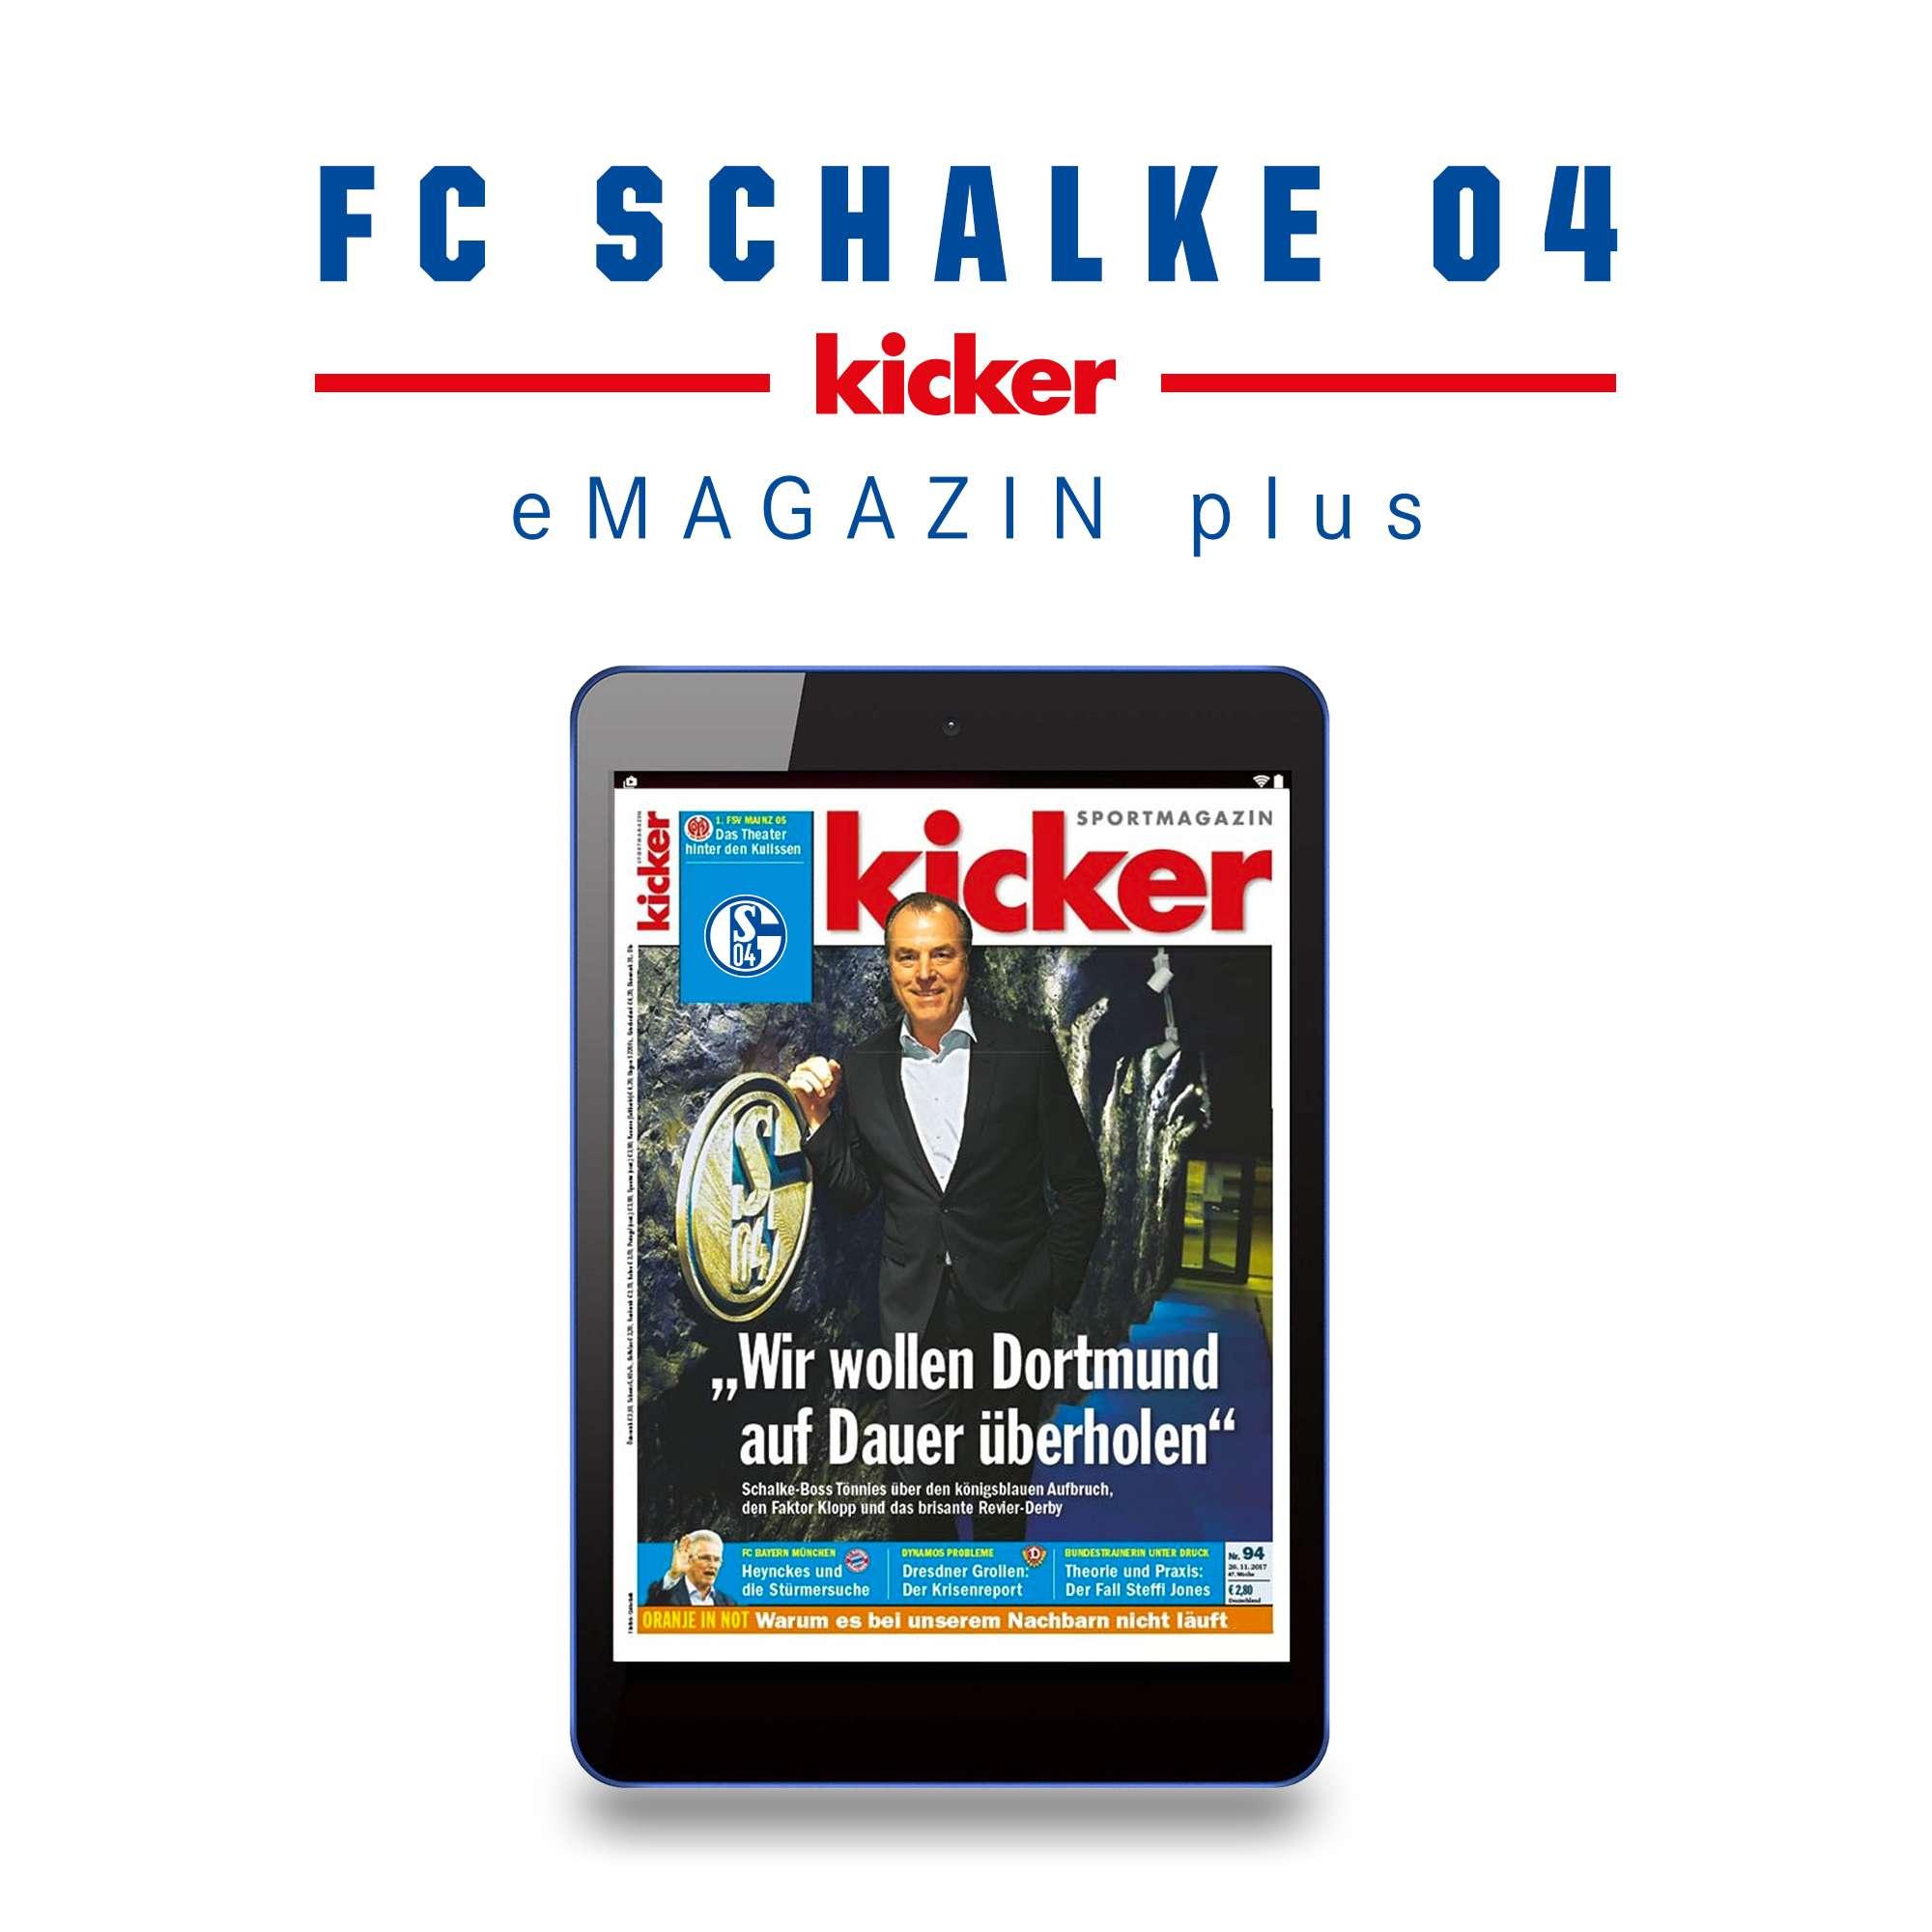 kicker eMagazine plus